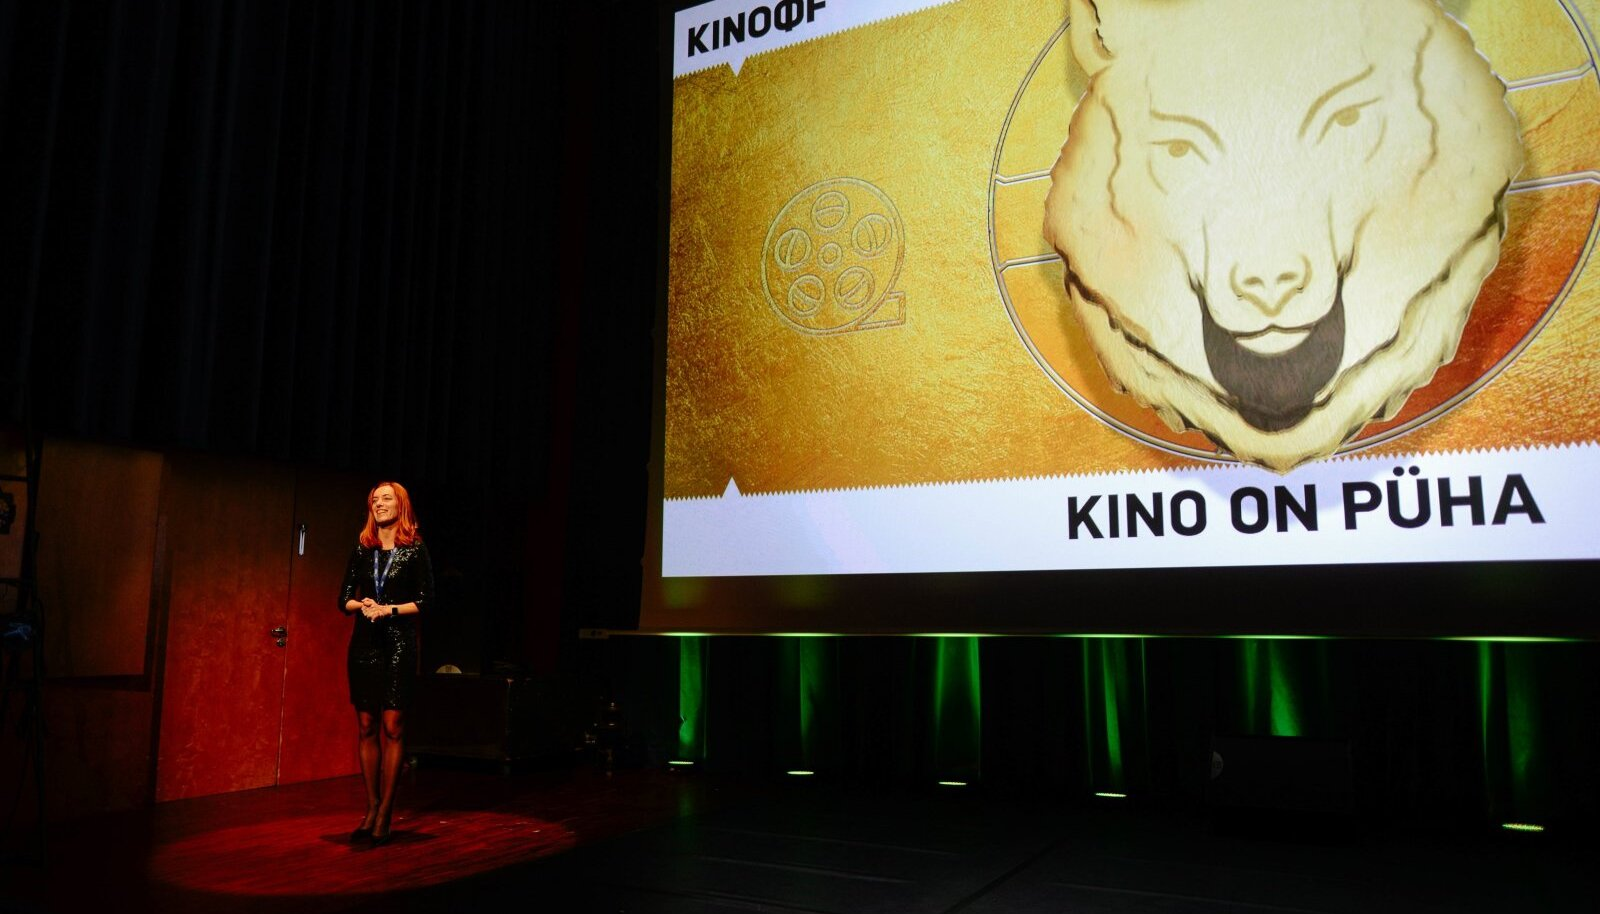 KinoFF 2020